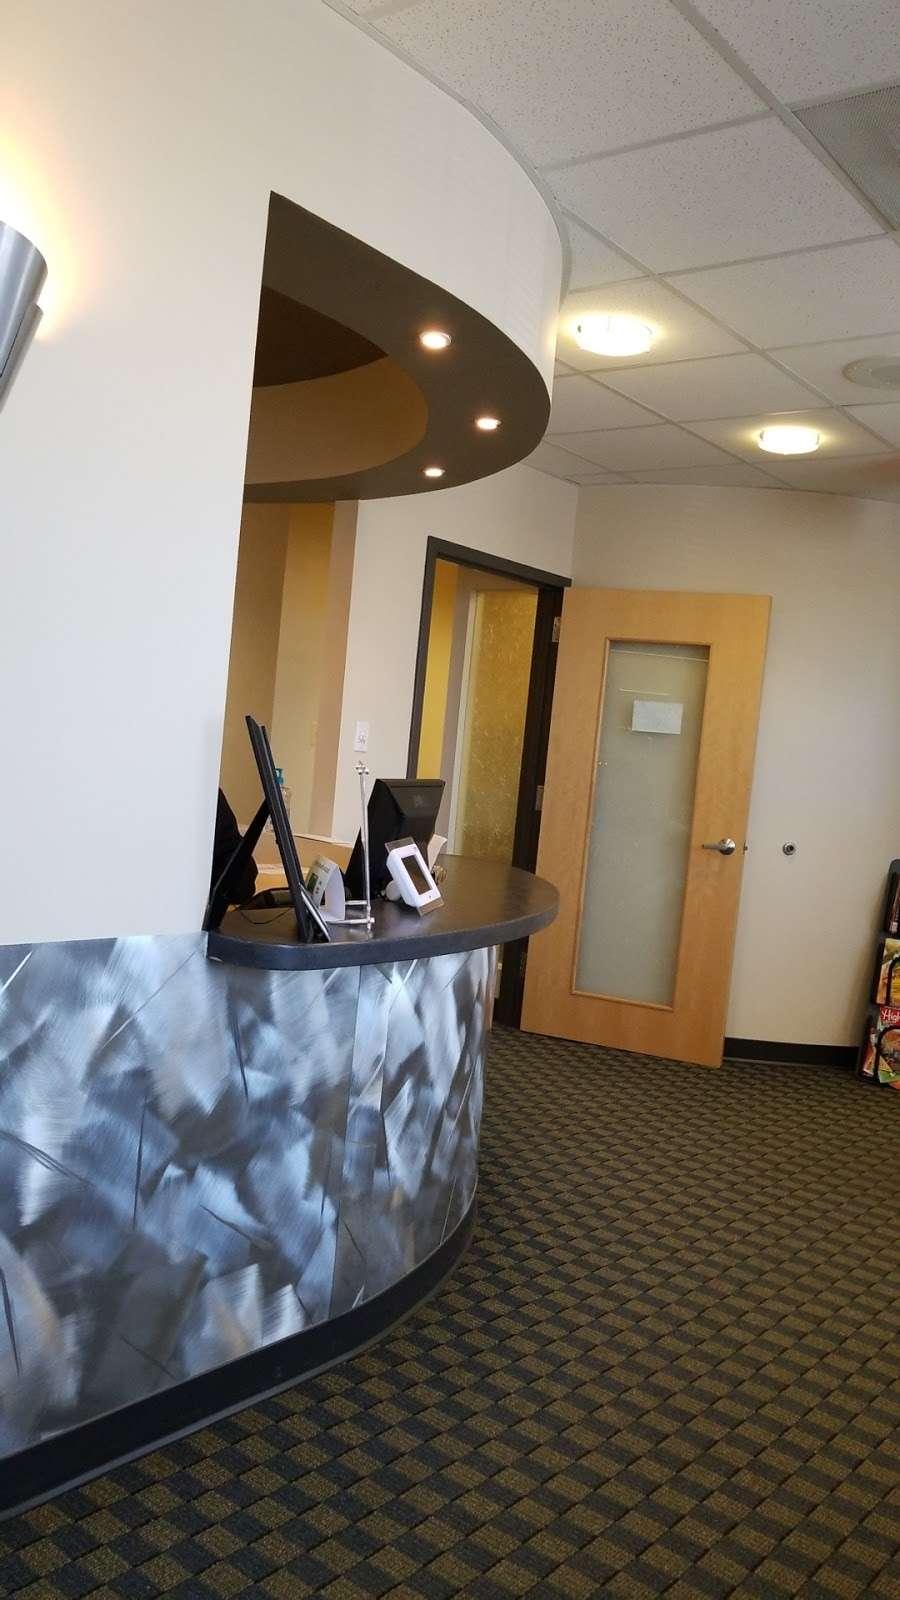 Frederick Dental Solutions: Ellahe Amini, D.M.D. - dentist  | Photo 1 of 1 | Address: 9099 Ridgefield Dr #206, Frederick, MD 21701, USA | Phone: (301) 663-7733